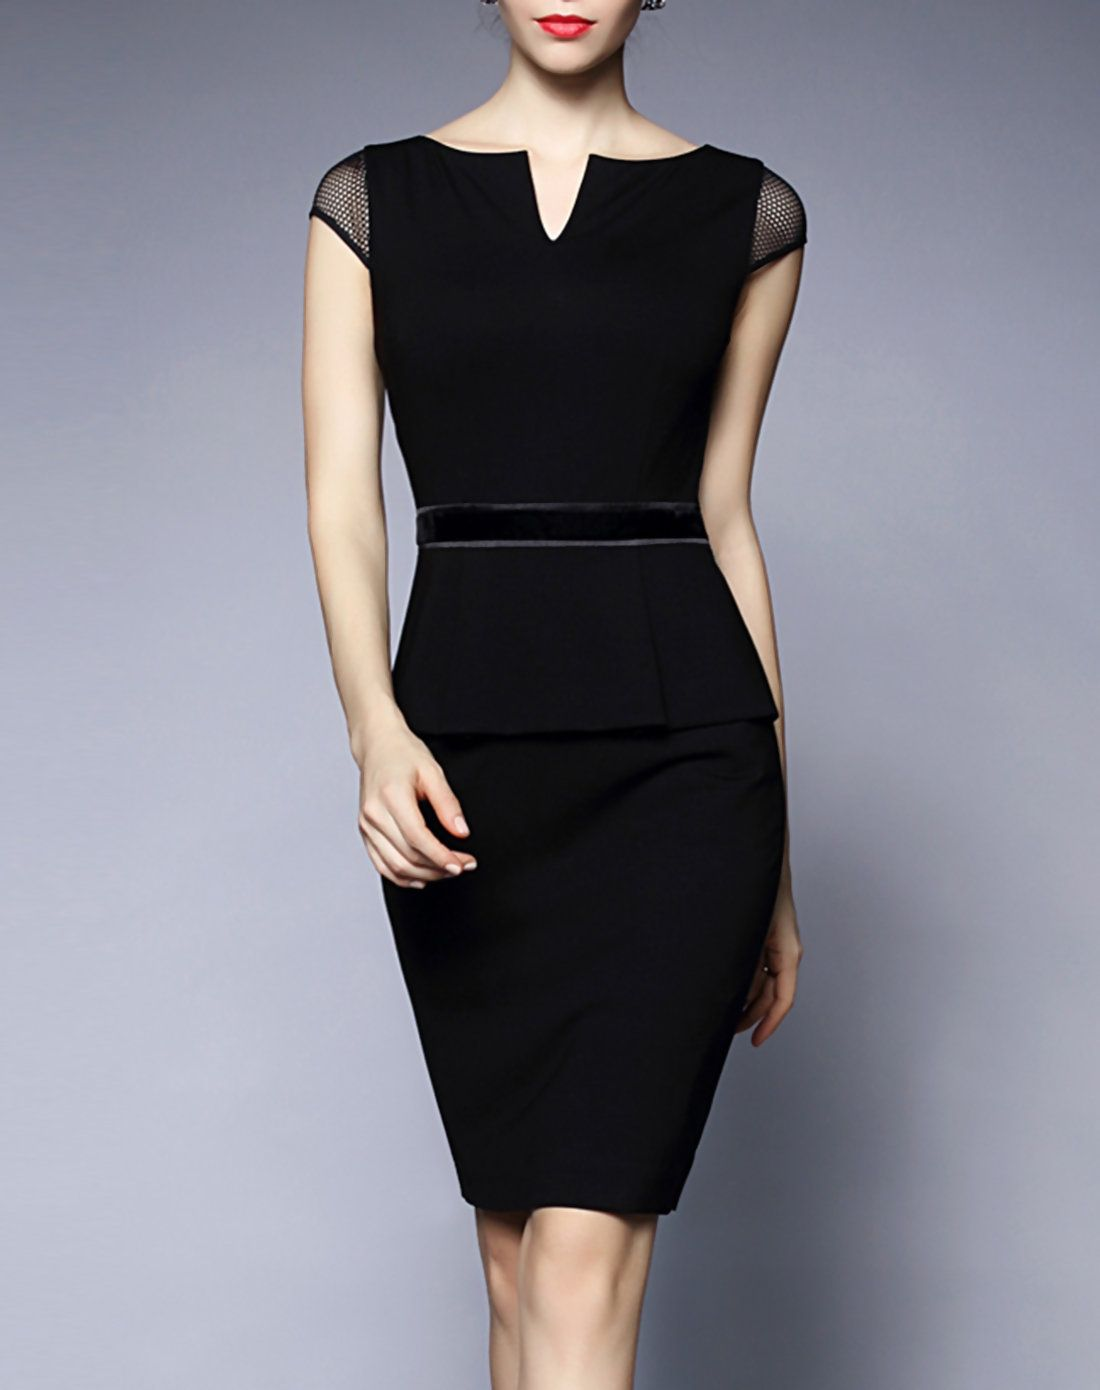 e9969587ace5 #AdoreWe #VIPme Bodycon Dresses - GYALWANA Cap Sleeve Peplum Bodycon Midi  Dress - AdoreWe